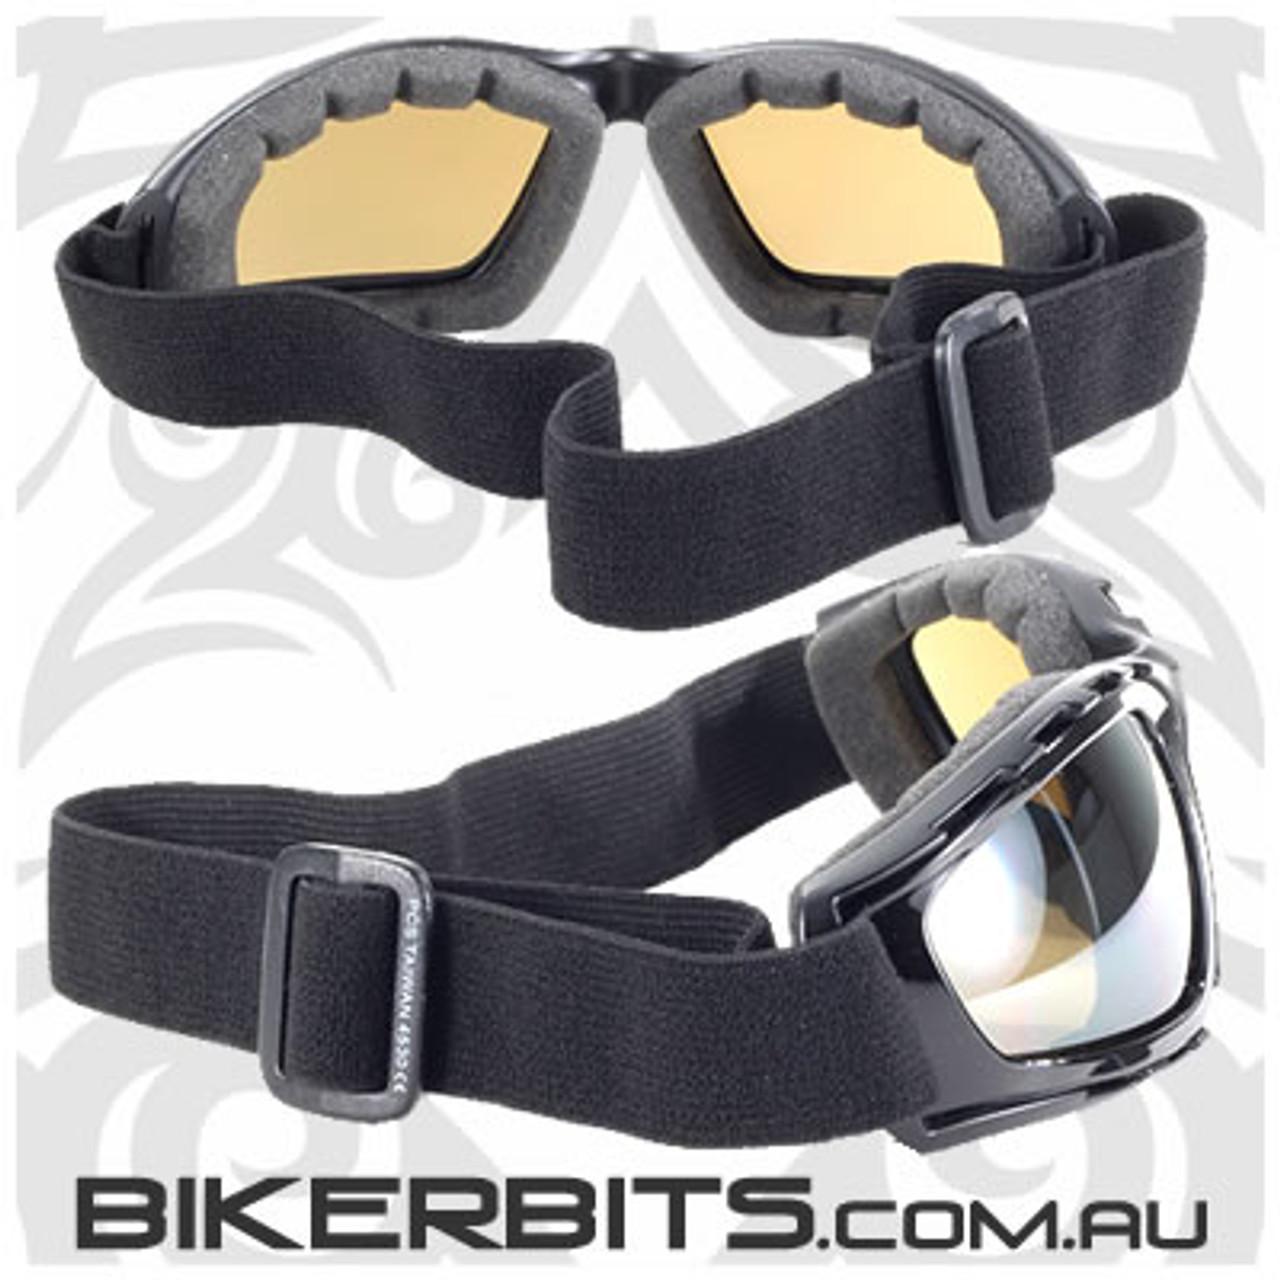 Motorcycle Goggles - Kickstart Force - Brown Lens /Silver Mirror